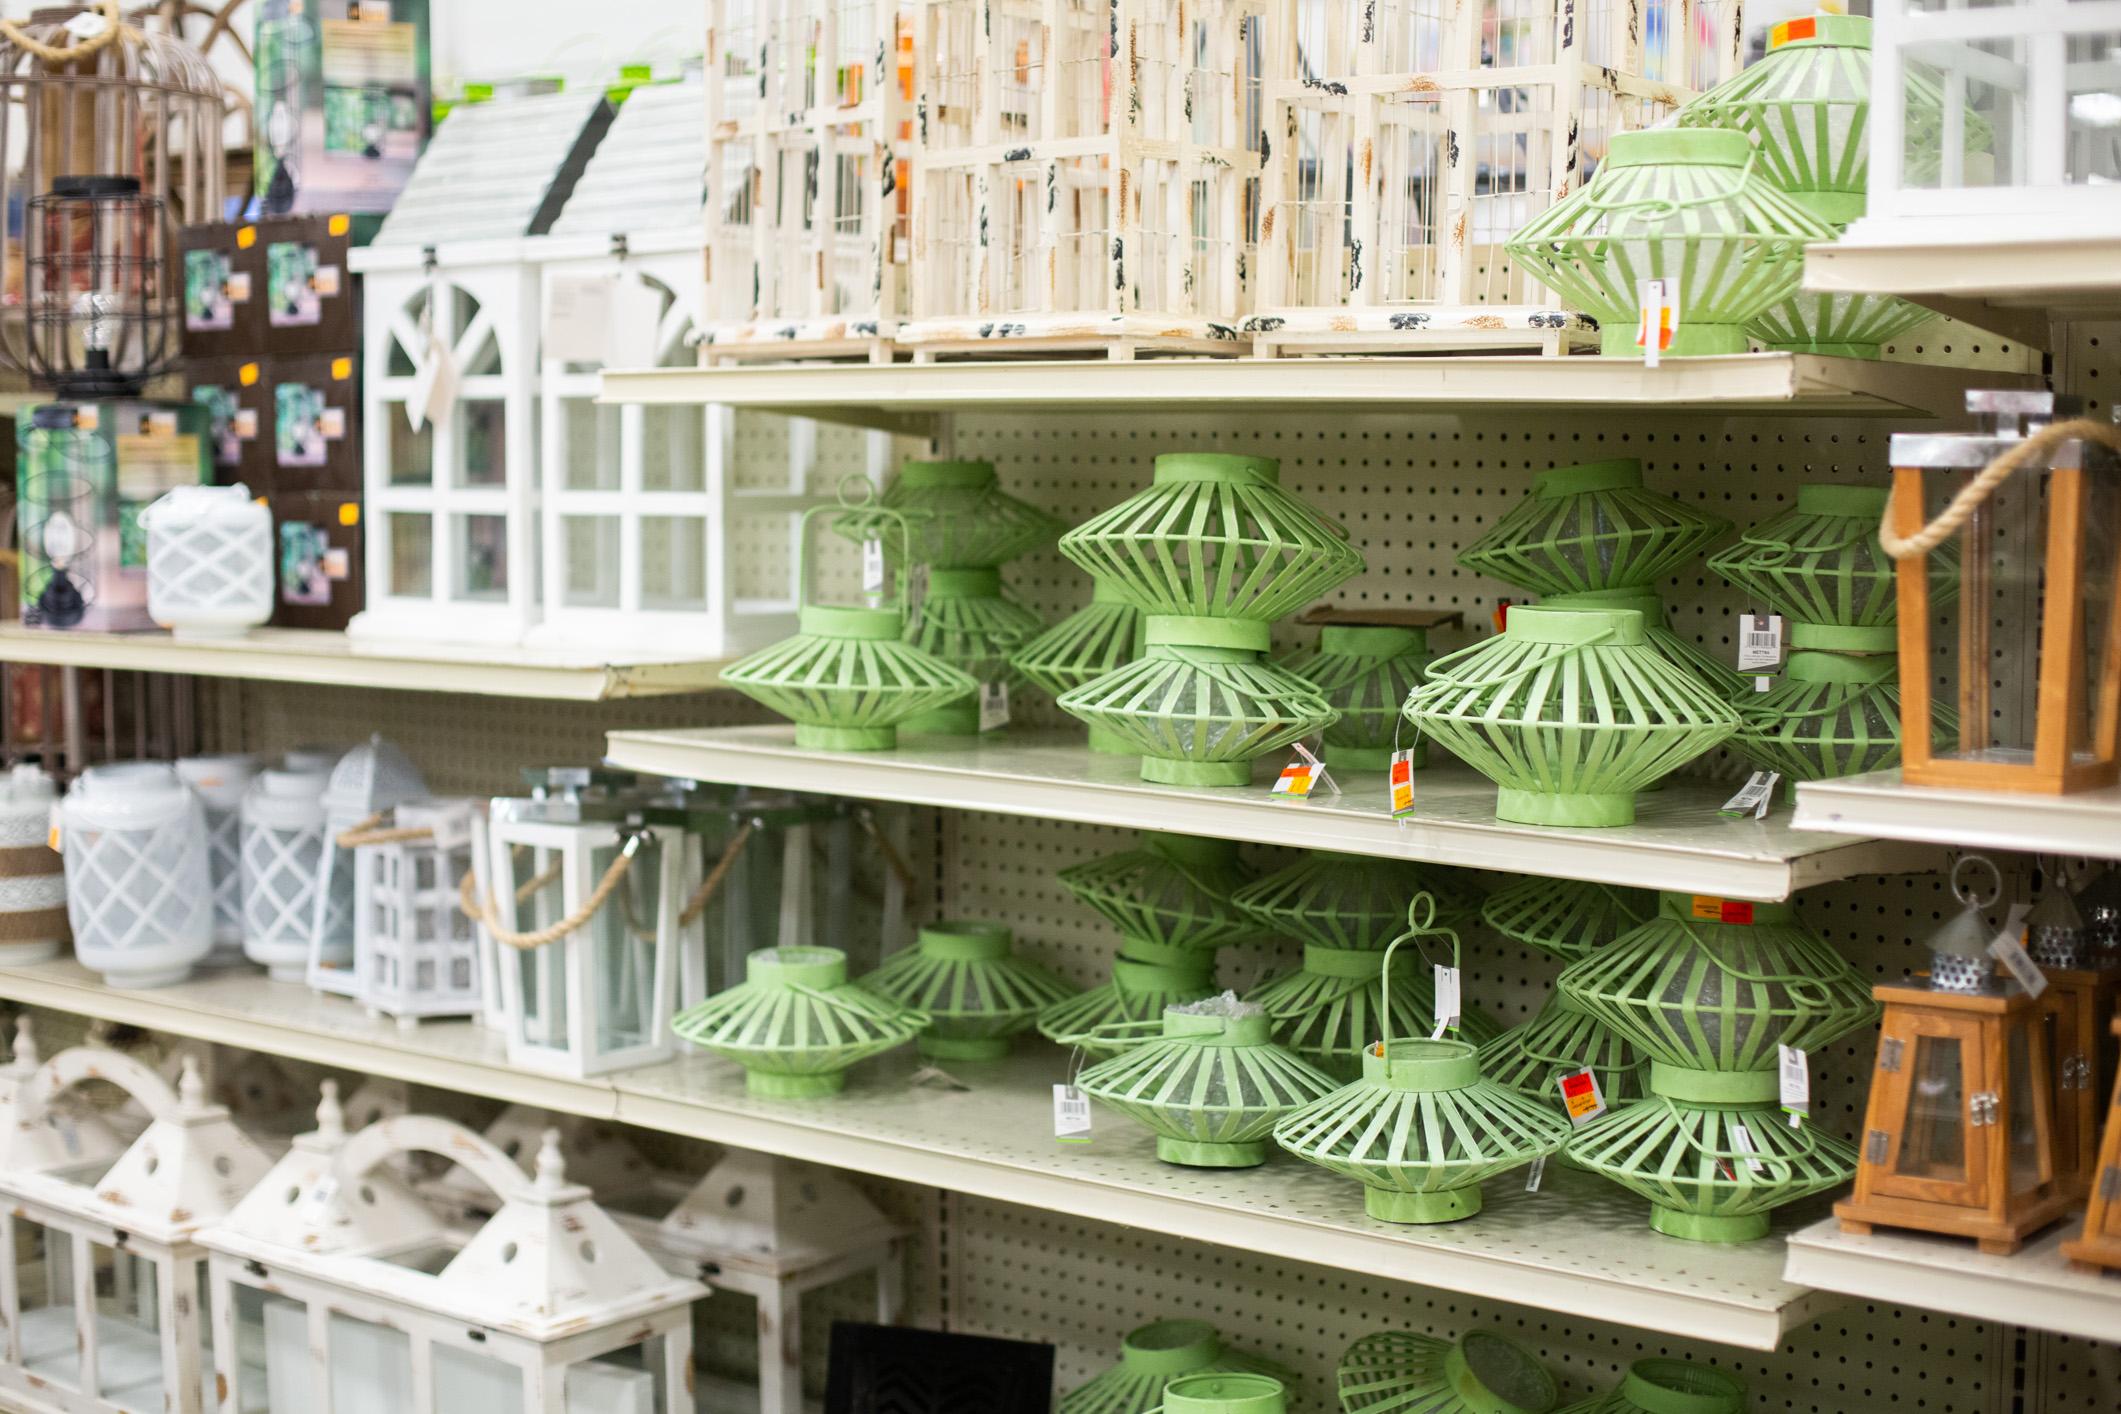 How To Decorate With Lanterns Carolina Pottery Diy Blog